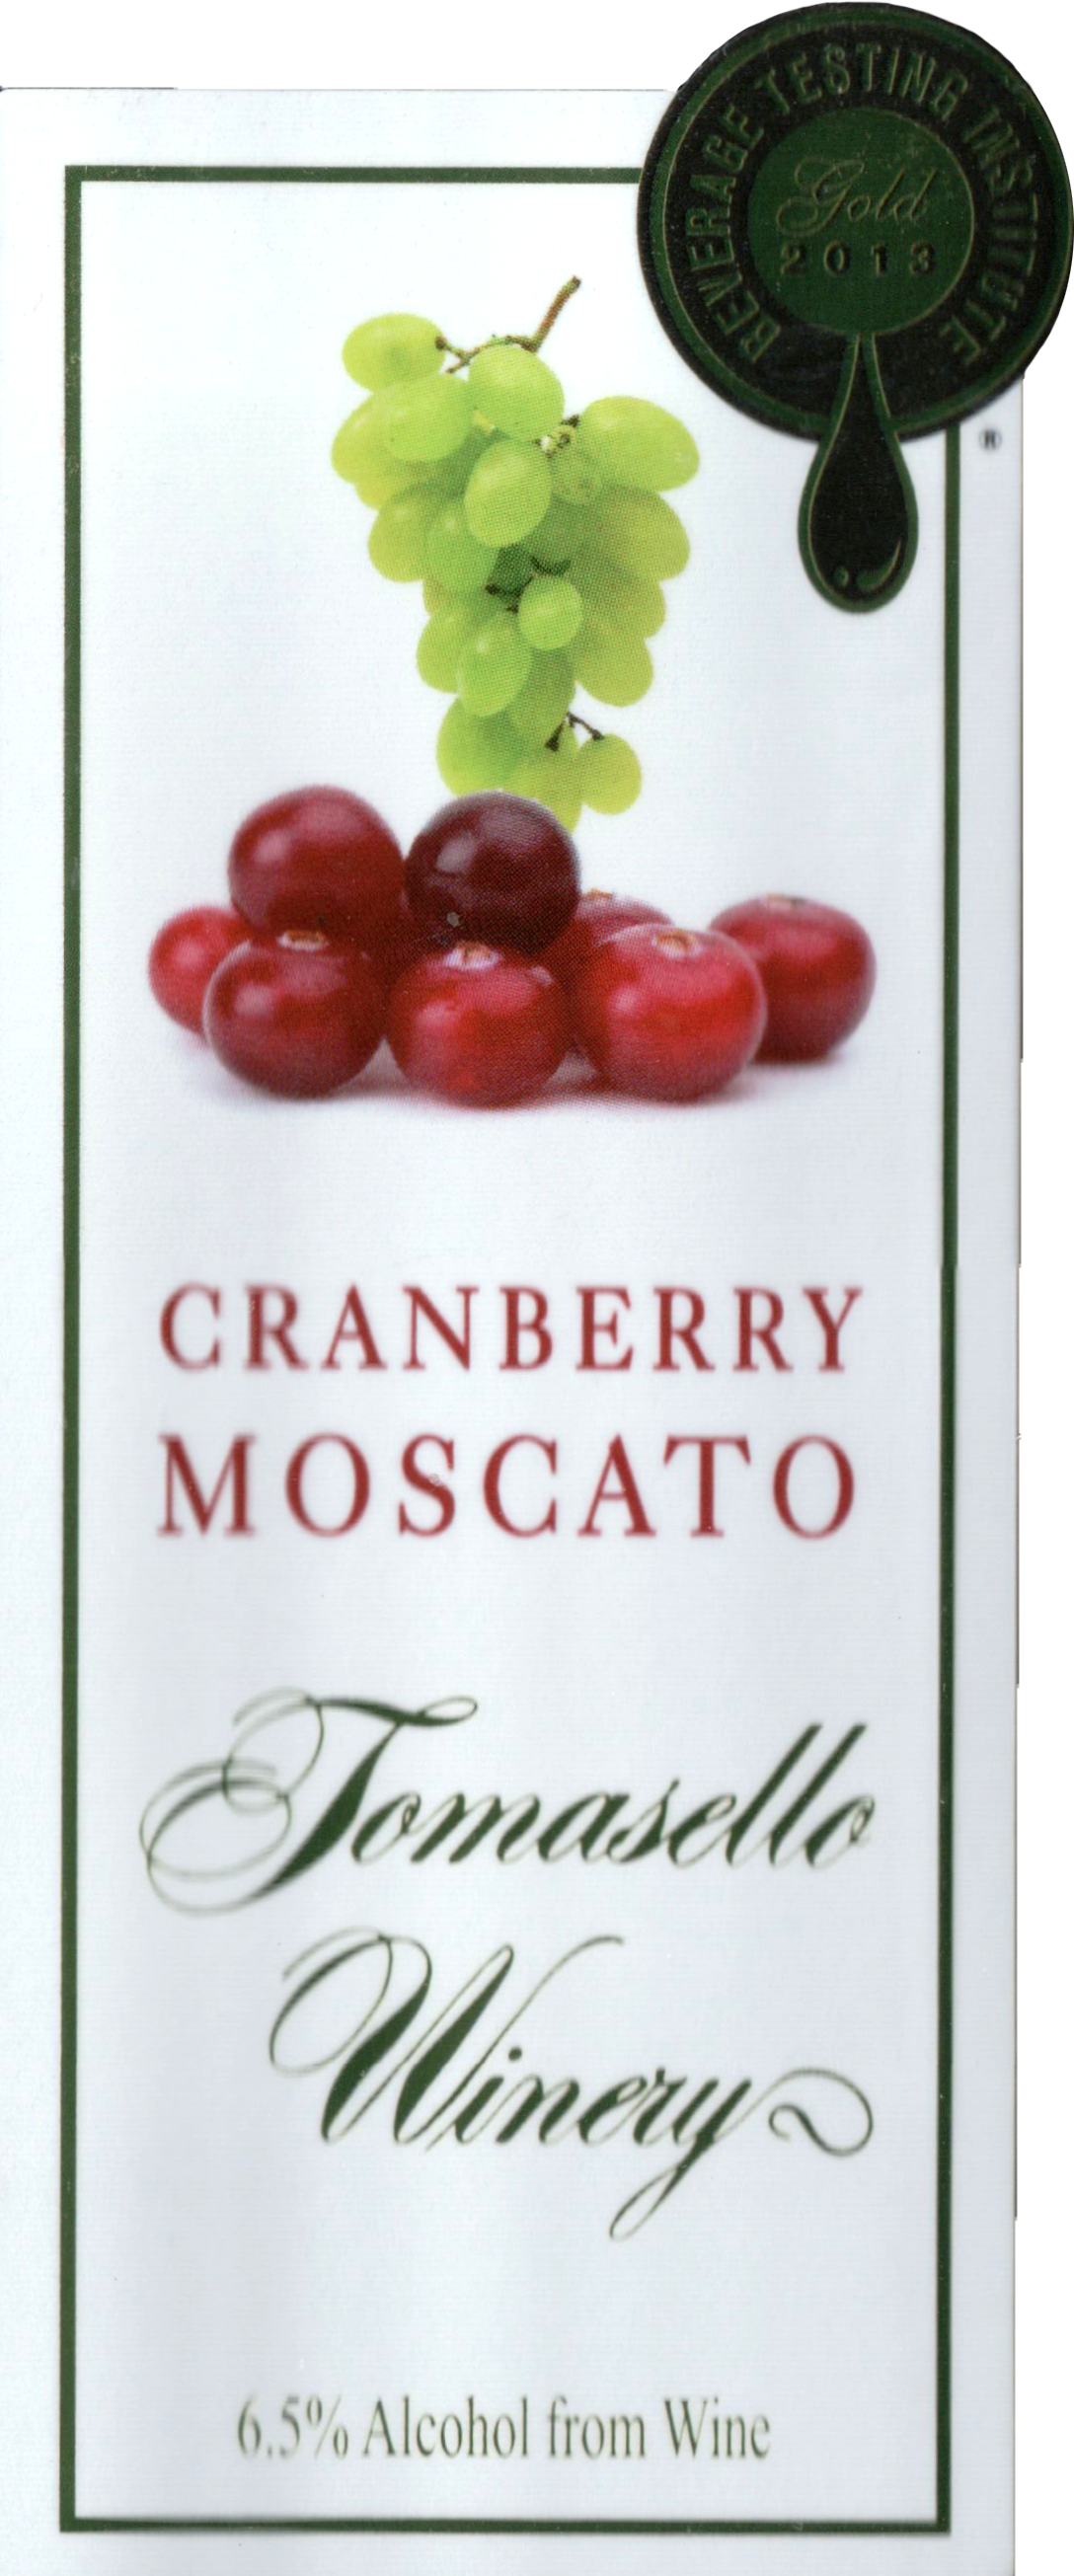 Tomasello Cranberry Moscato